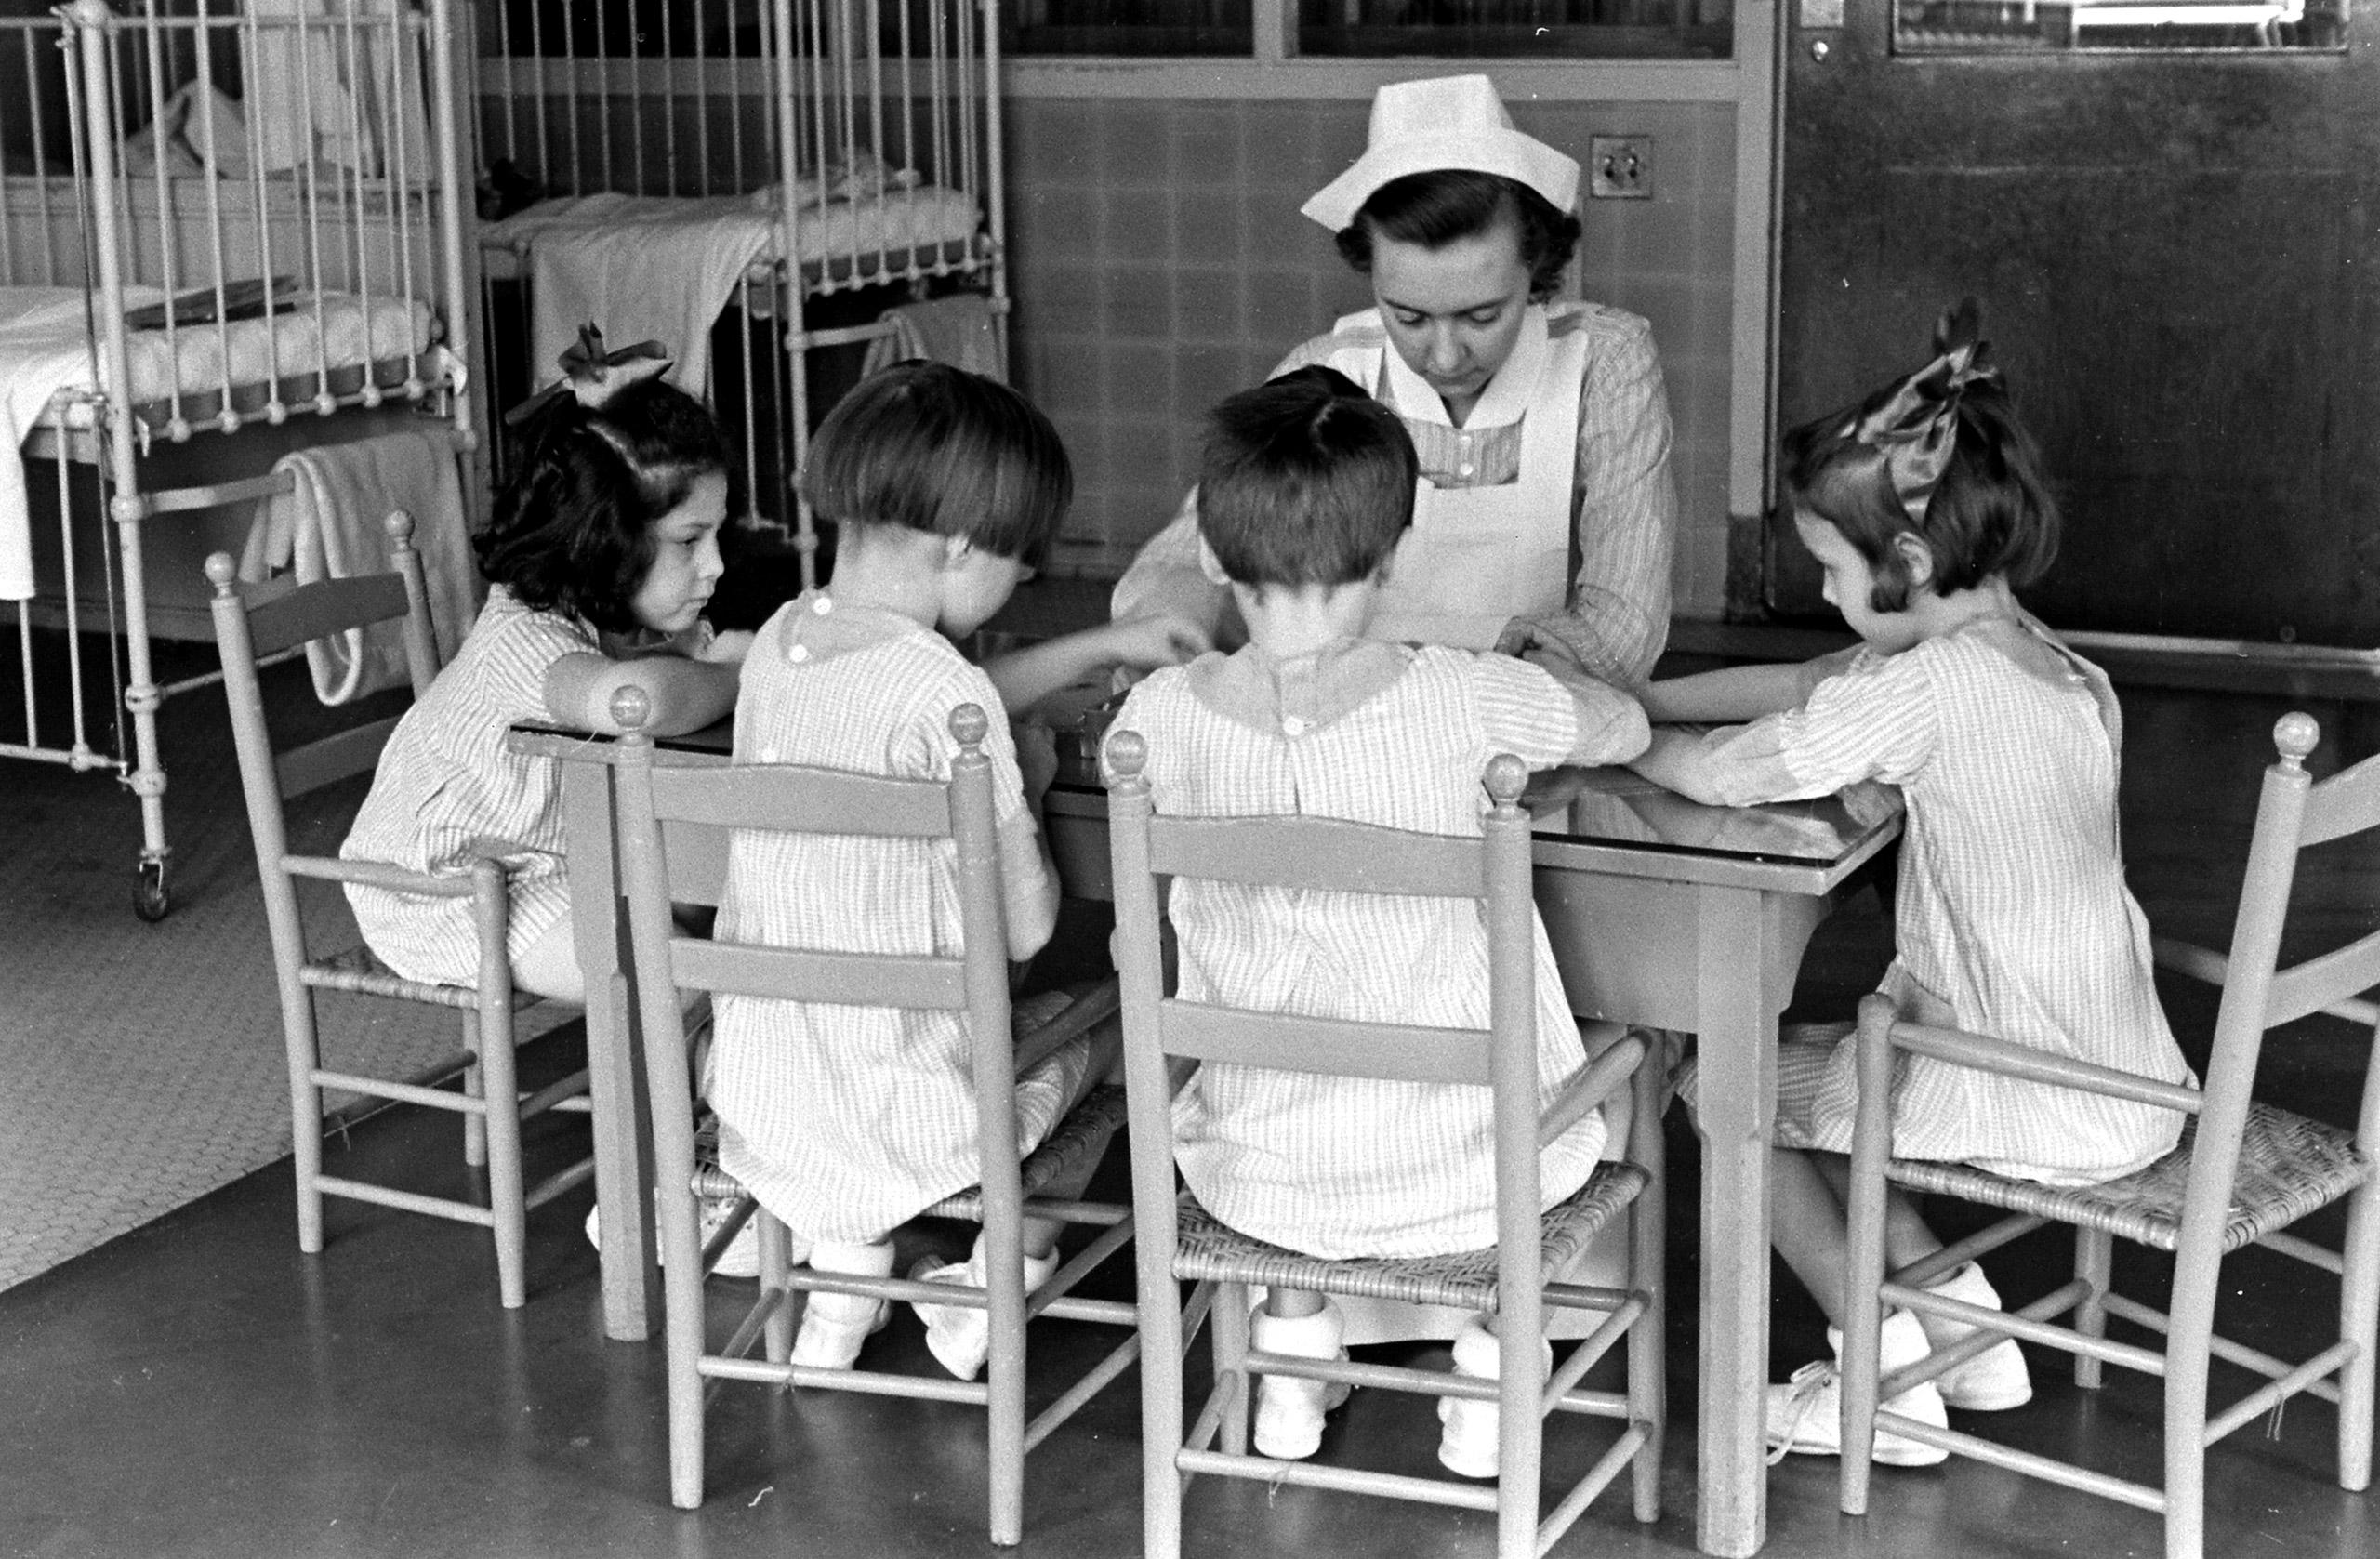 Student nurse with children at New York's Roosevelt Hospital, 1938.